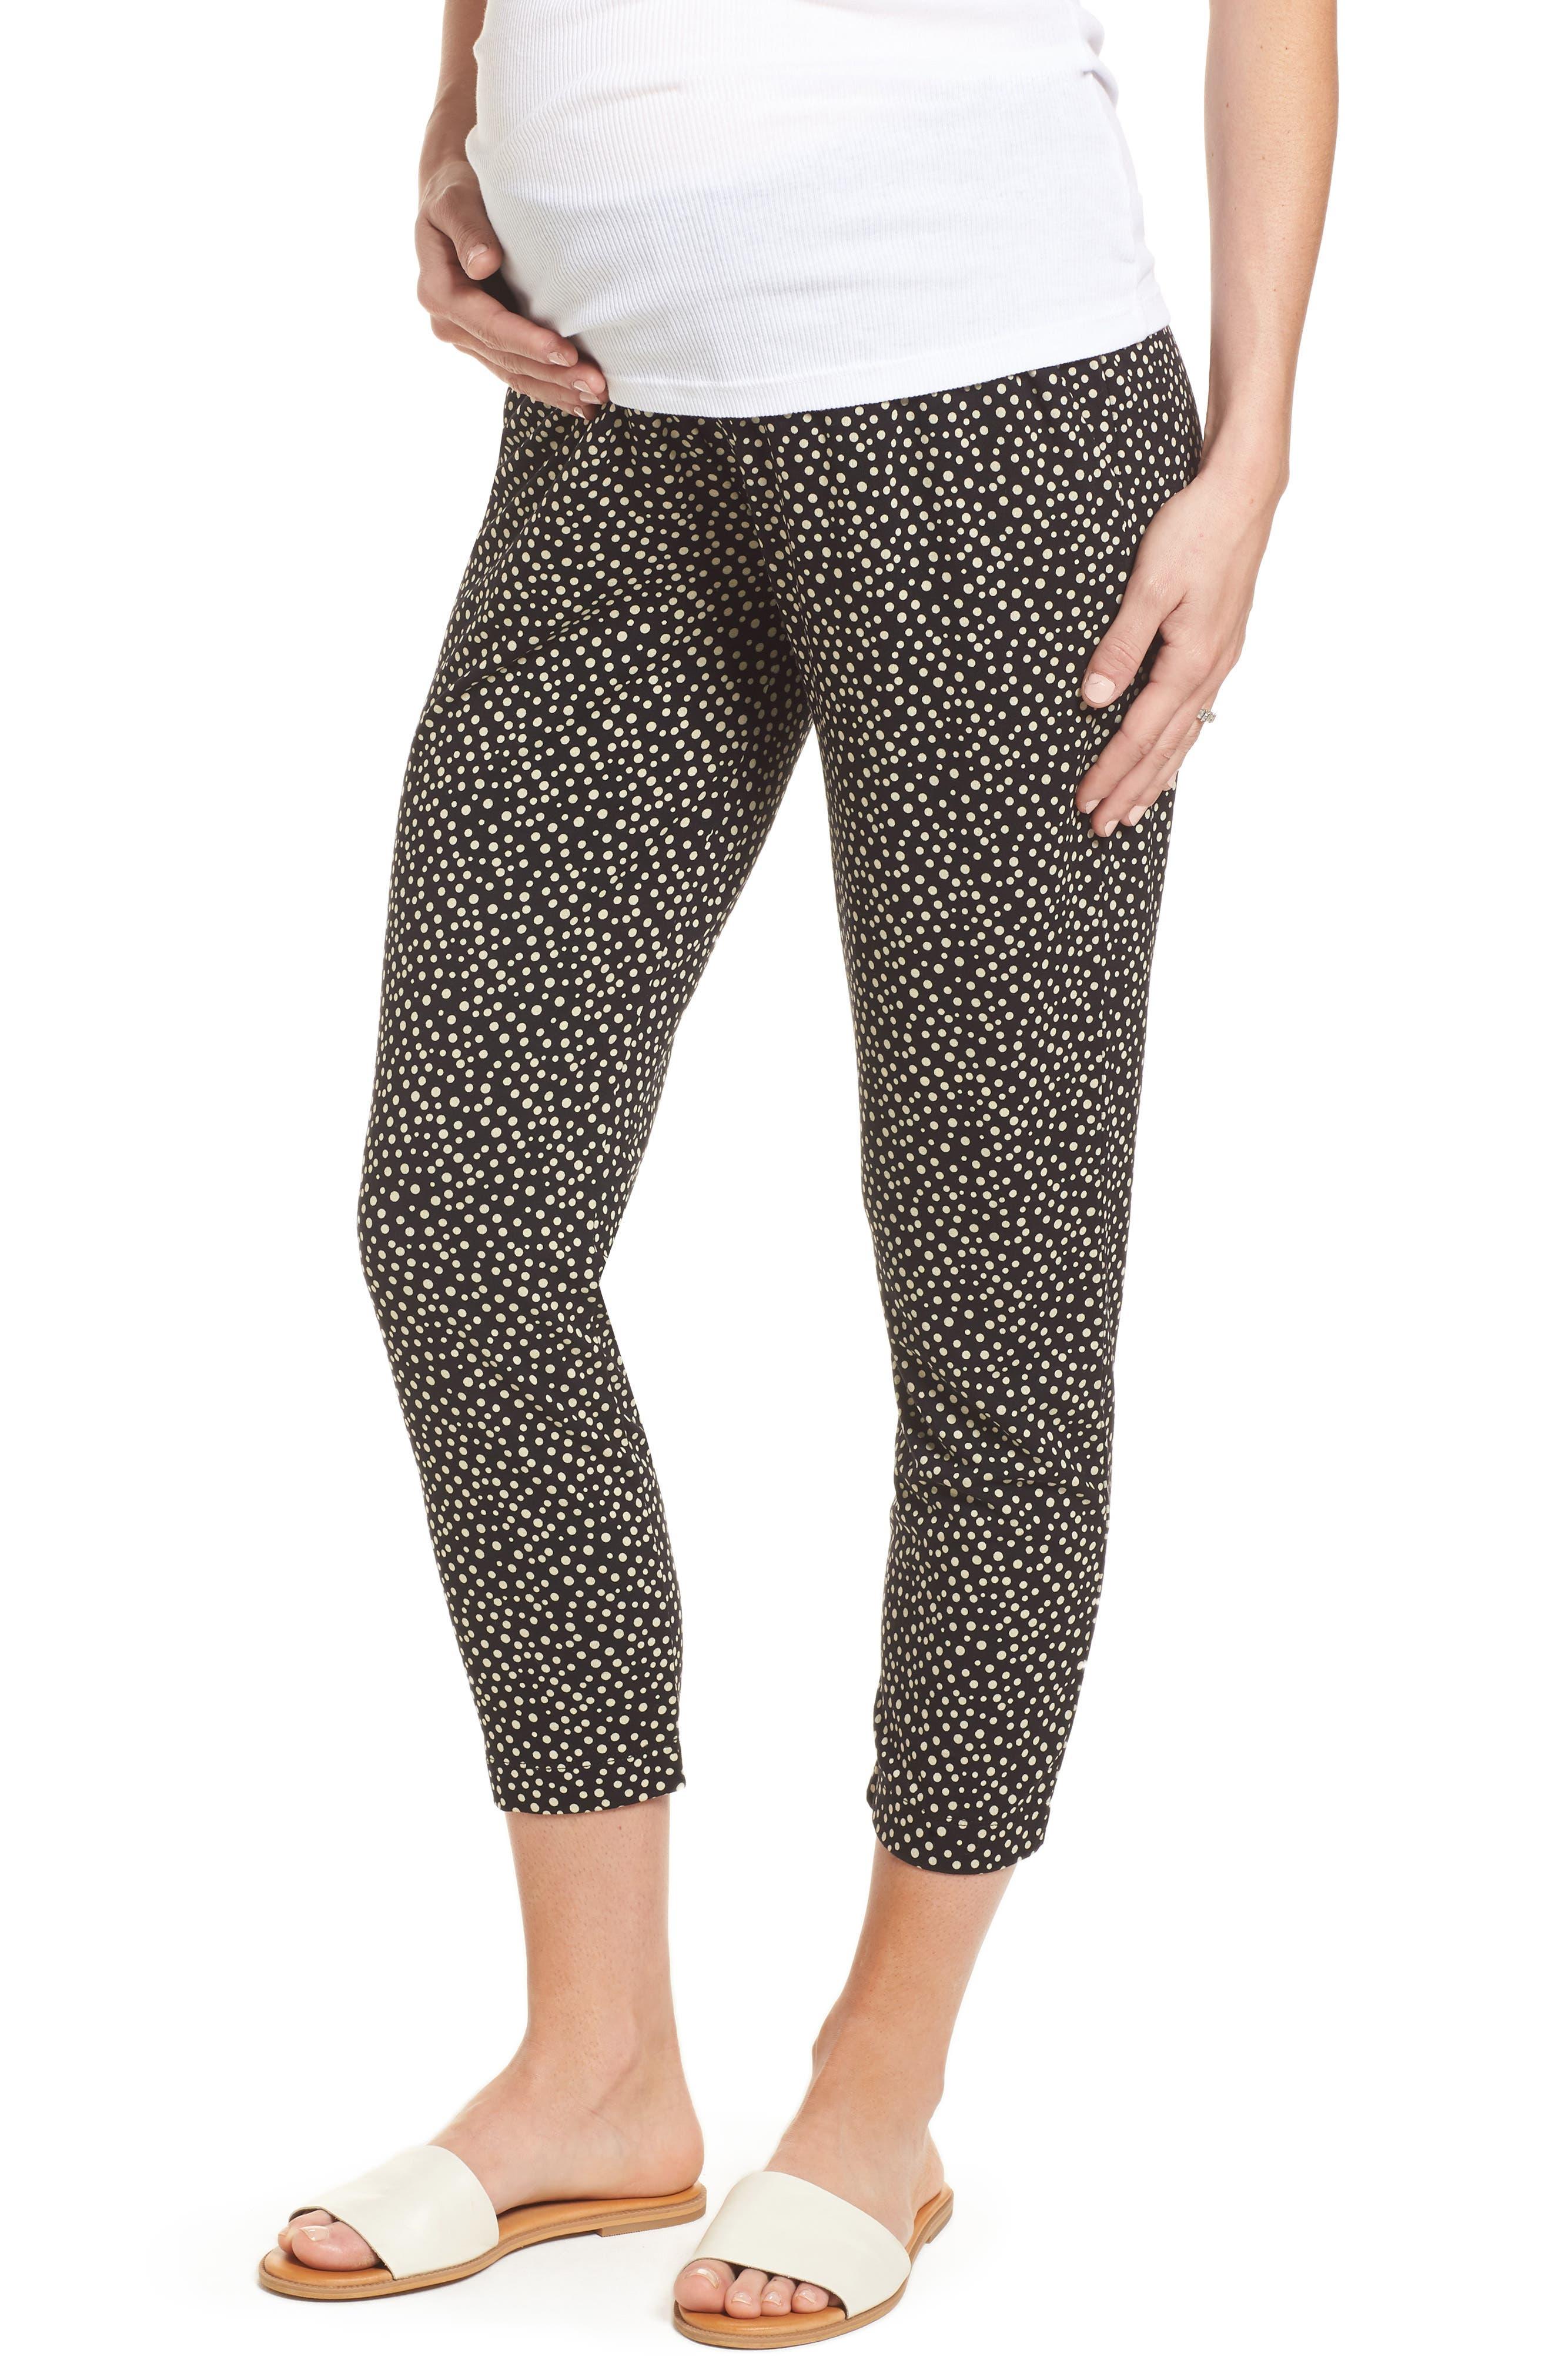 Danni Maternity Tapered Trousers,                         Main,                         color, Polka Print